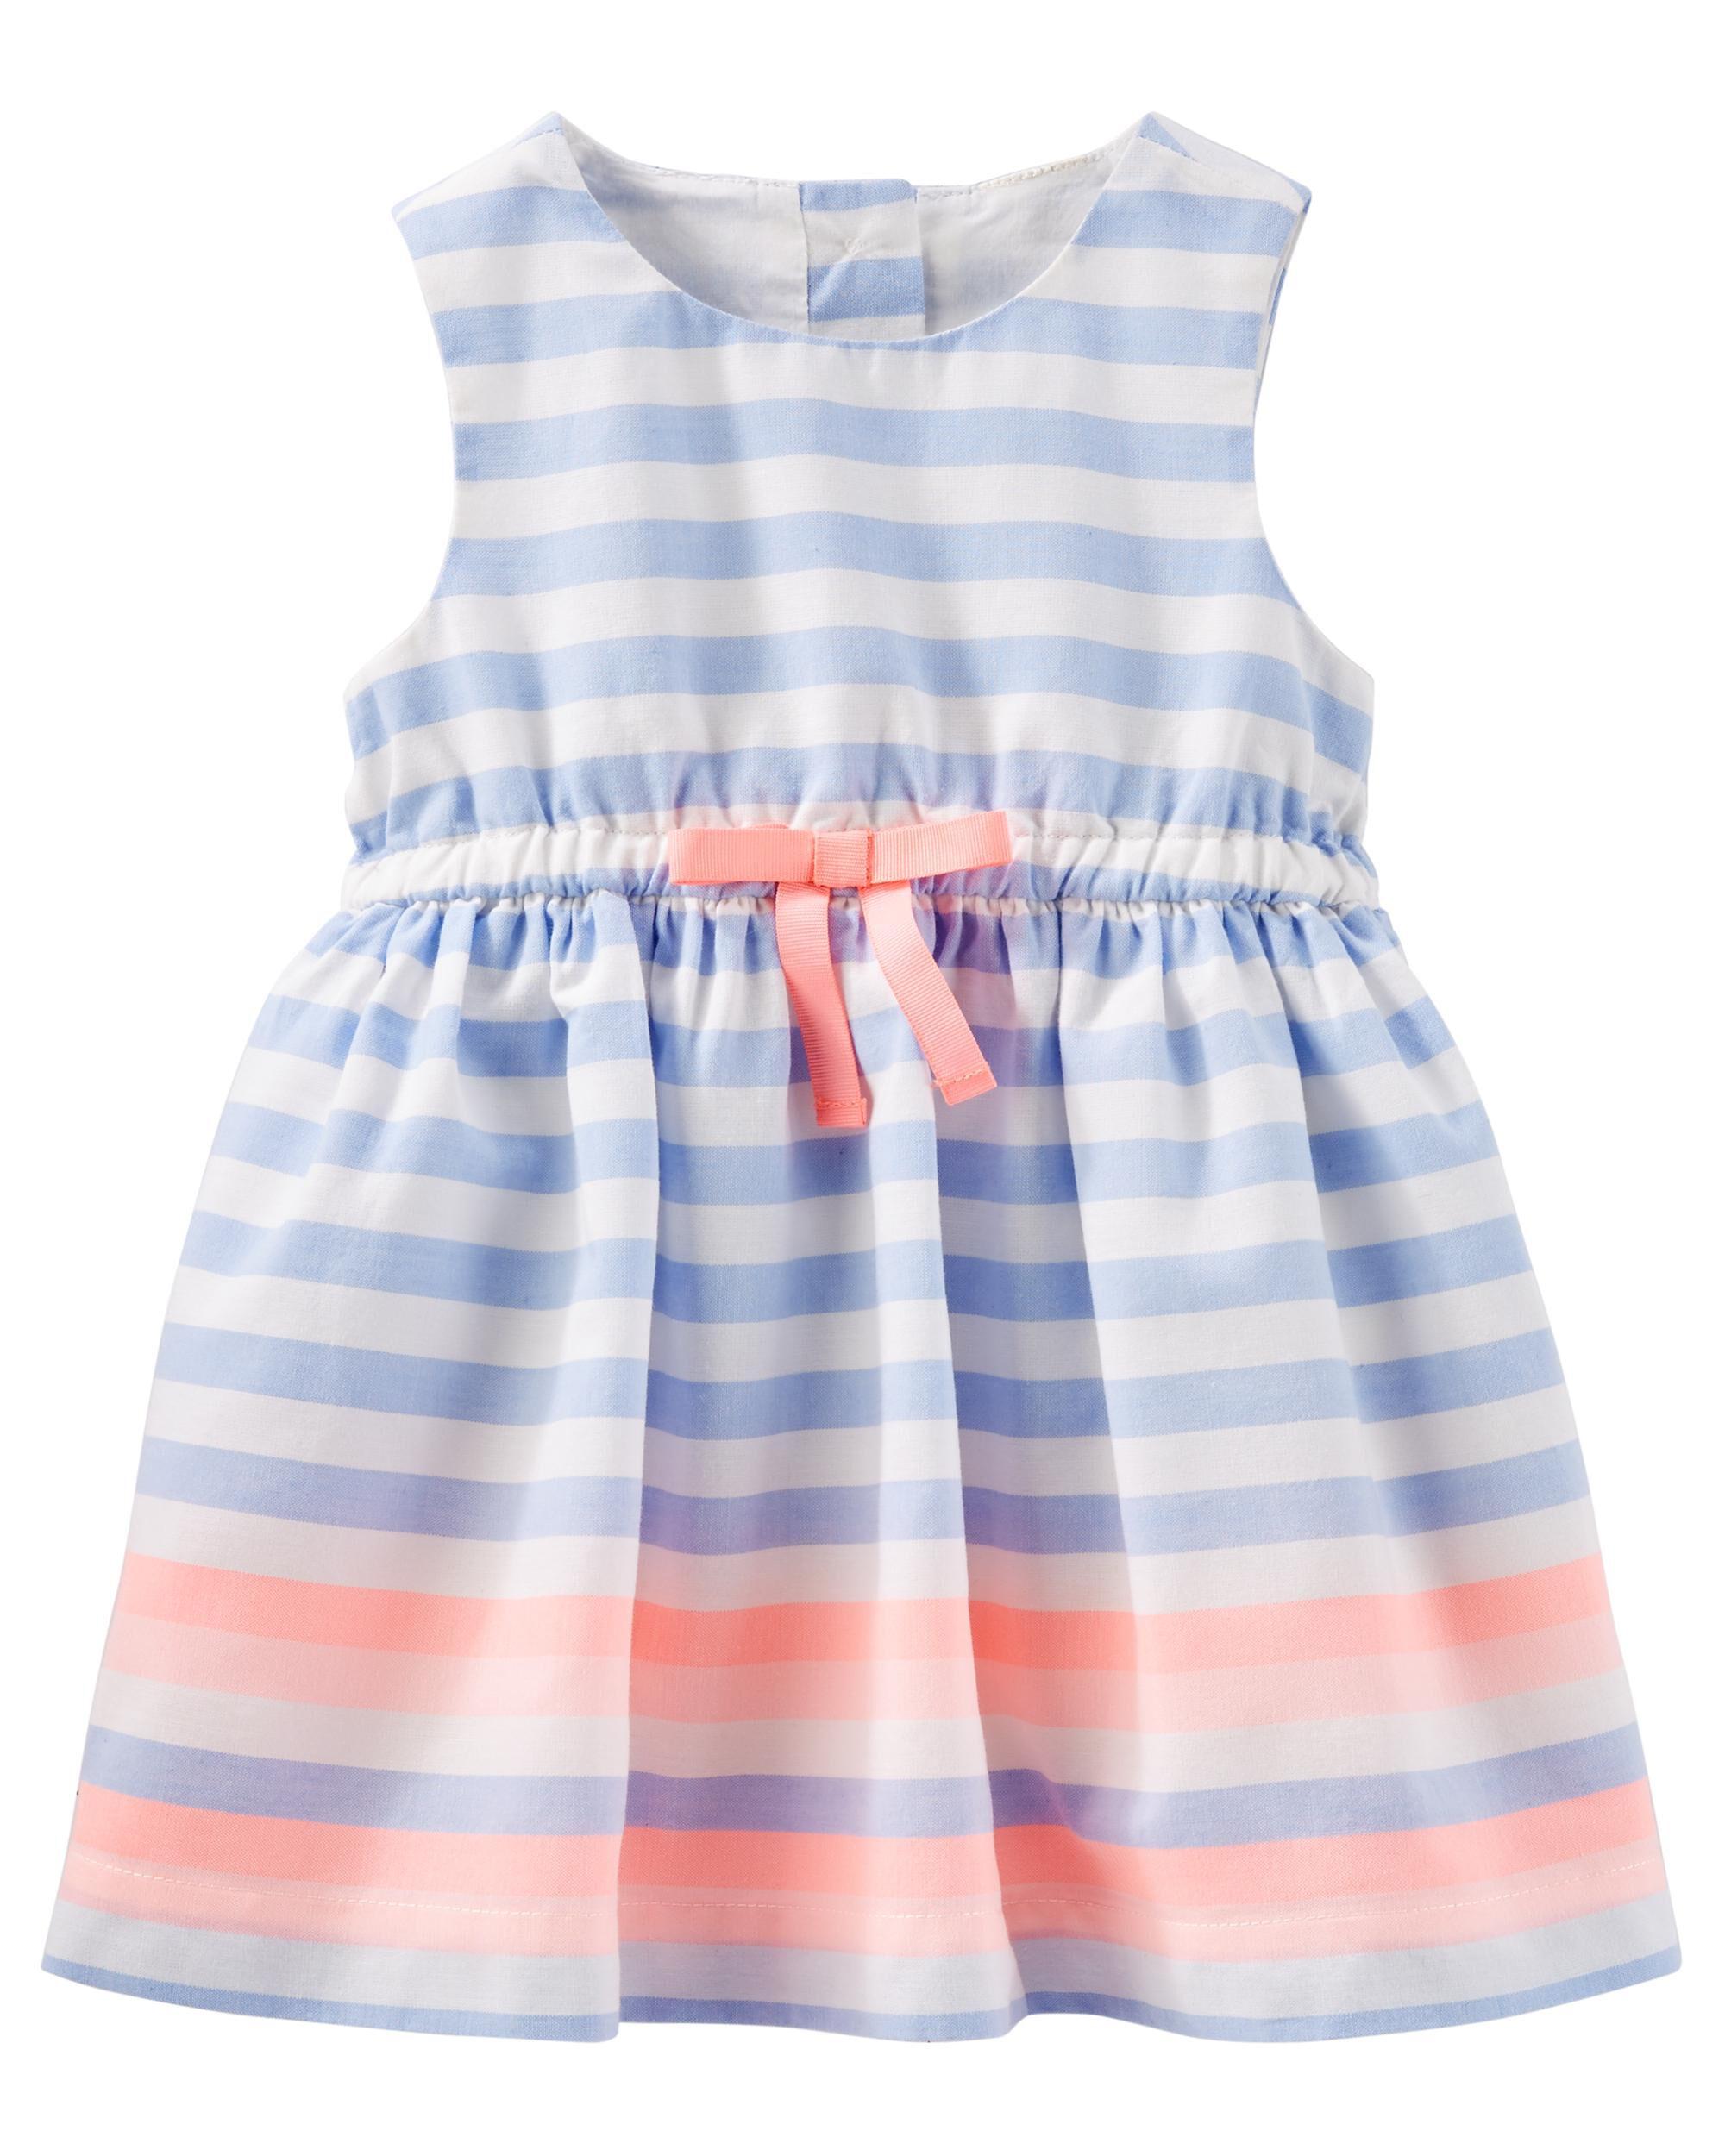 Baby girl easter dresses outfits oshkosh free shipping easter shop negle Choice Image